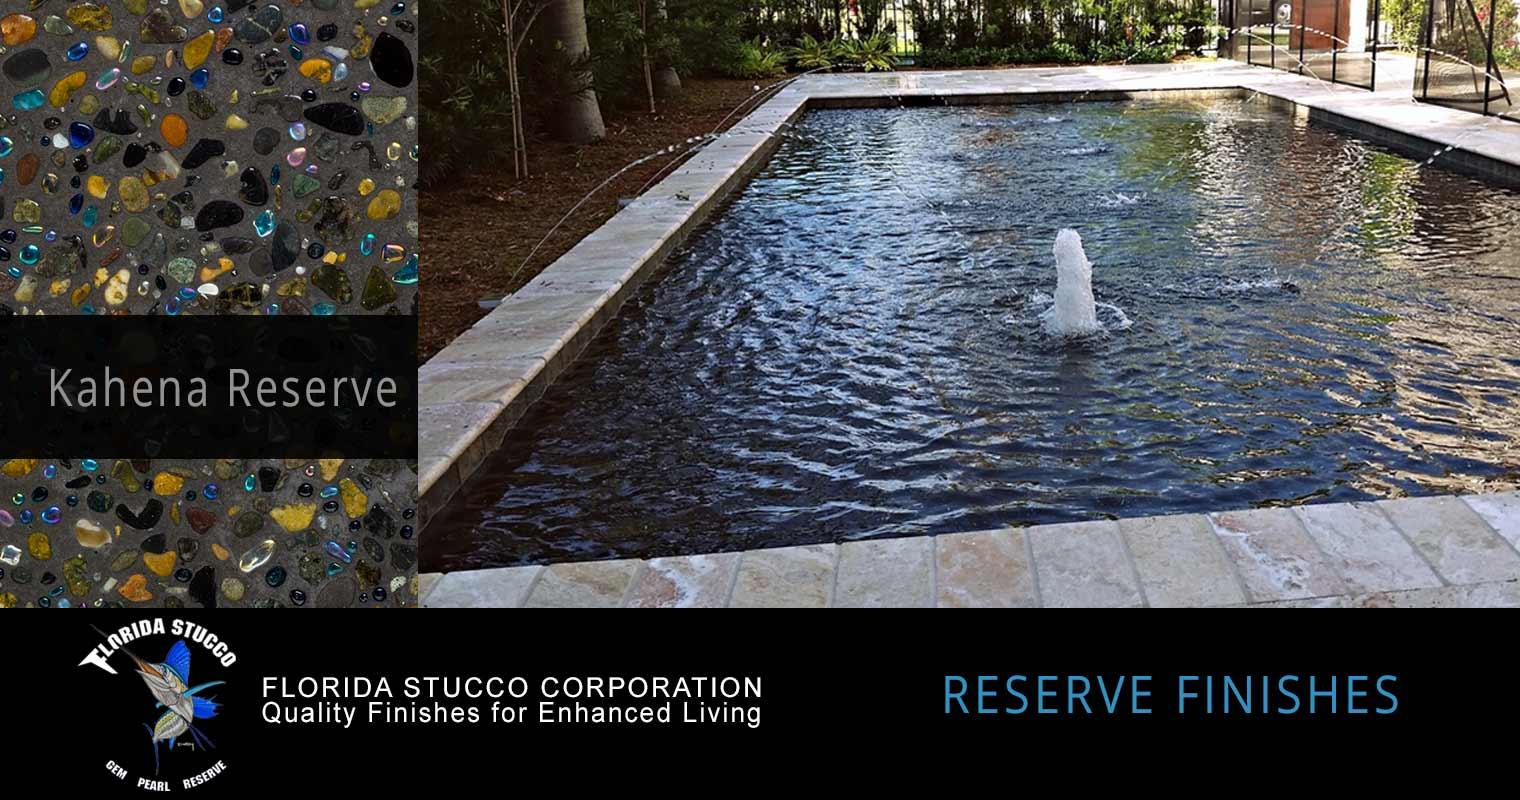 Florida Stucco - Kahena Reserve Gem and Glass Plastering Finish Pool Sample 1